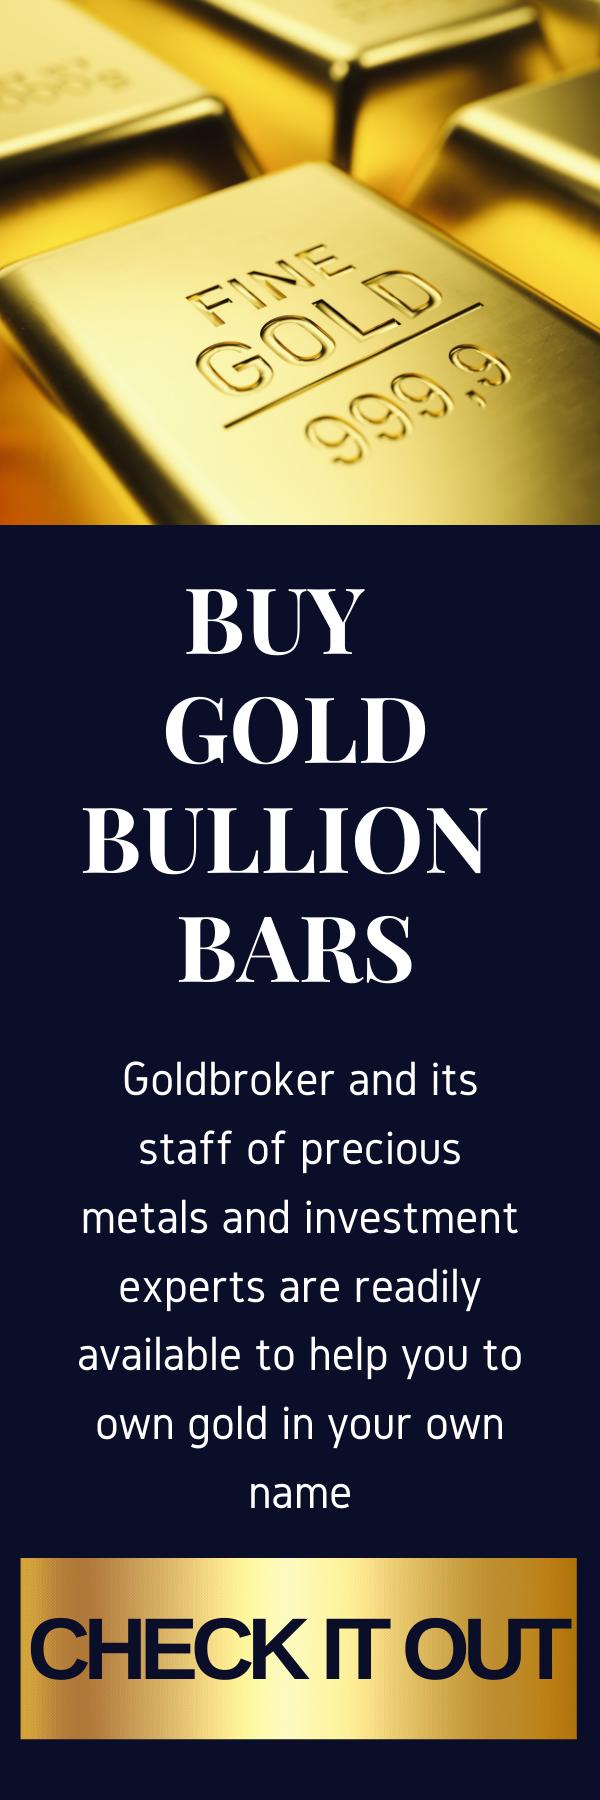 numismatic traders buy gold bullion bars